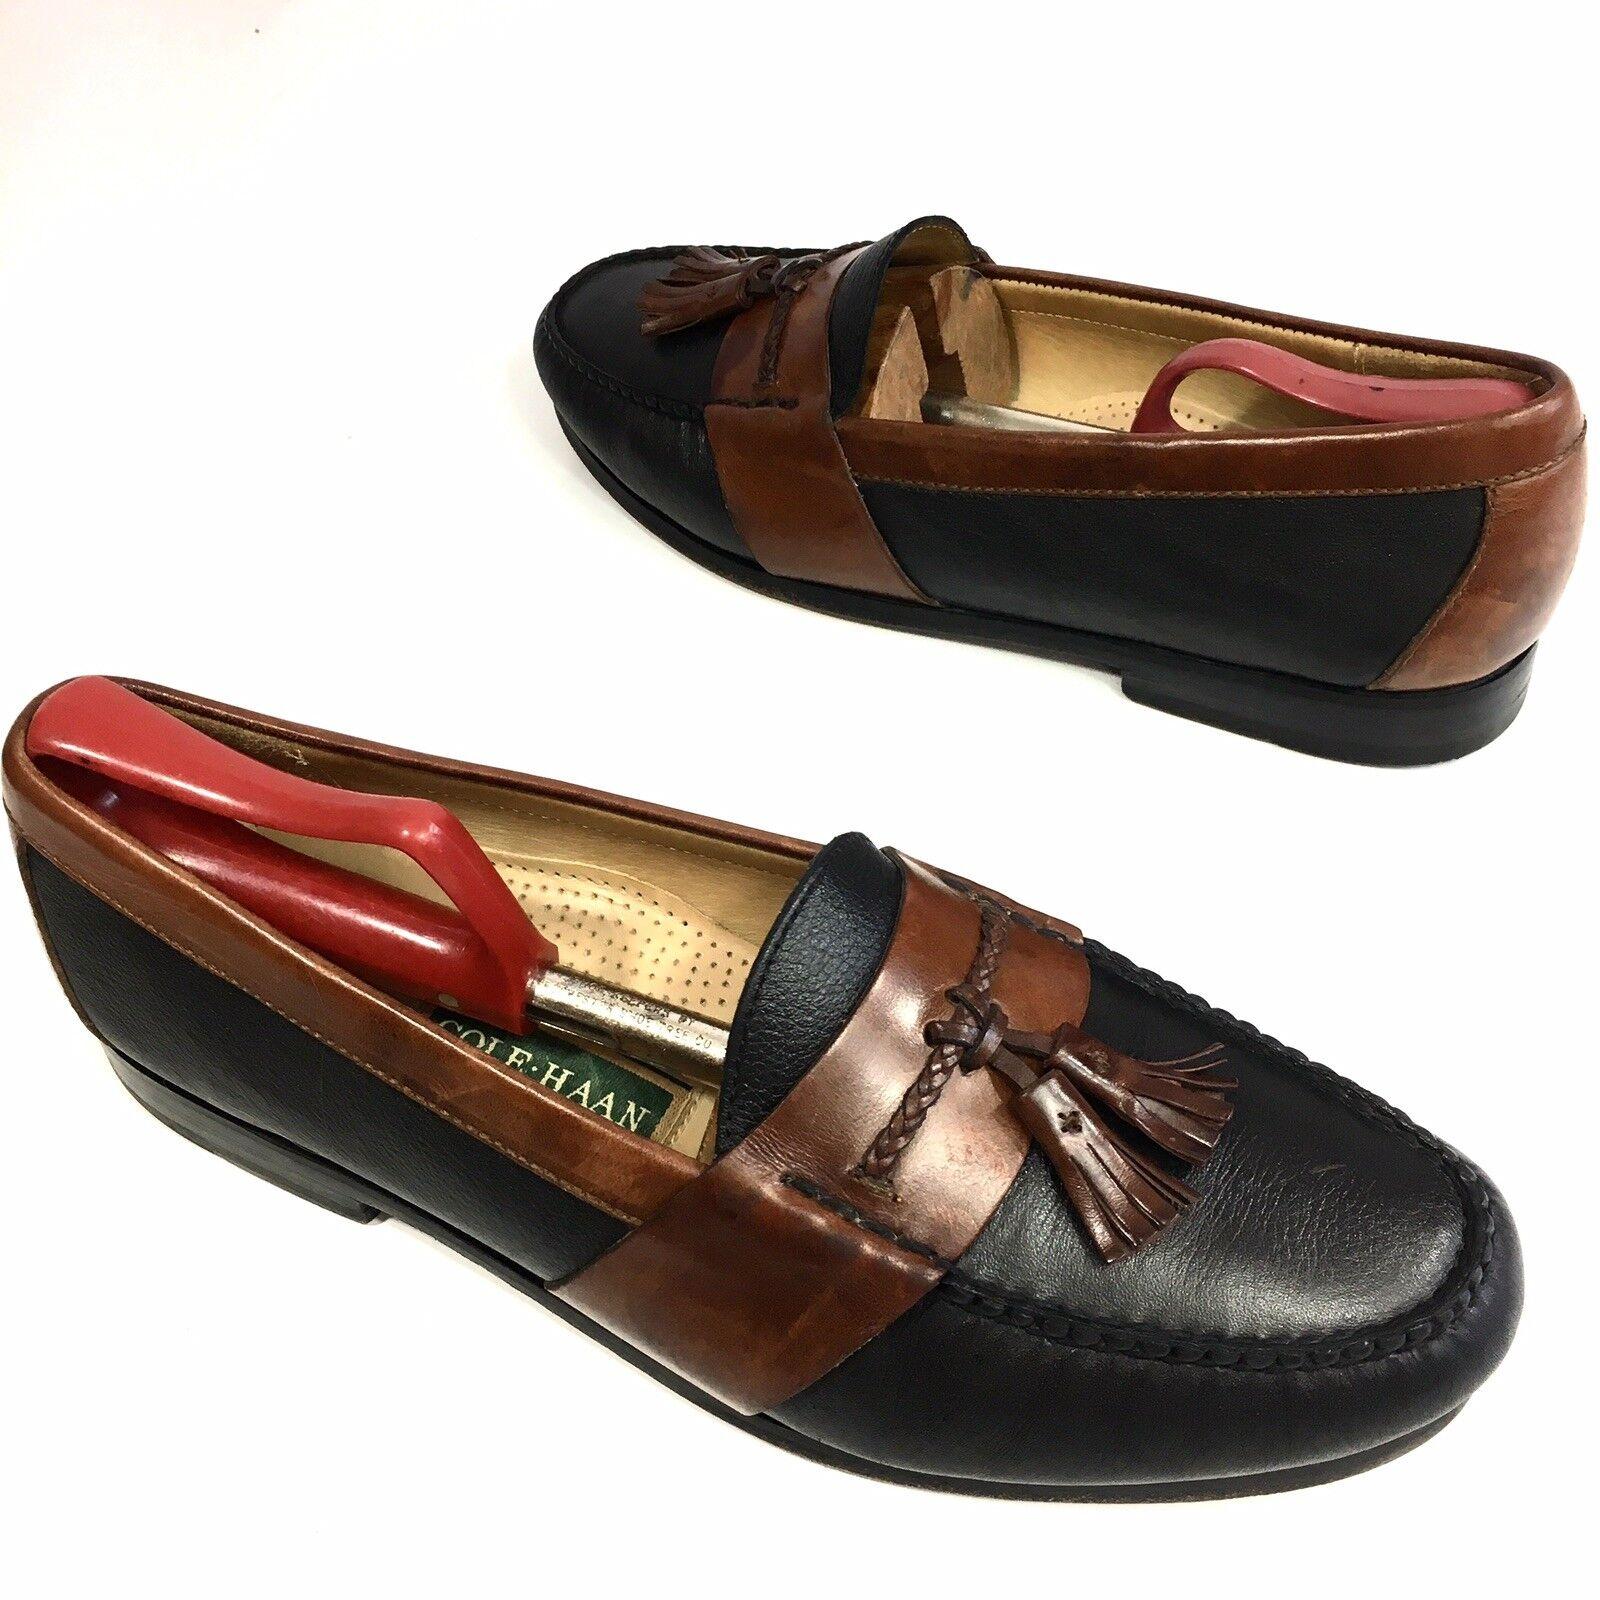 COLE HAAN Men's 2-Tone BLACK Brown Soft Leather DRESS shoes TASSEL Loafers 11 D